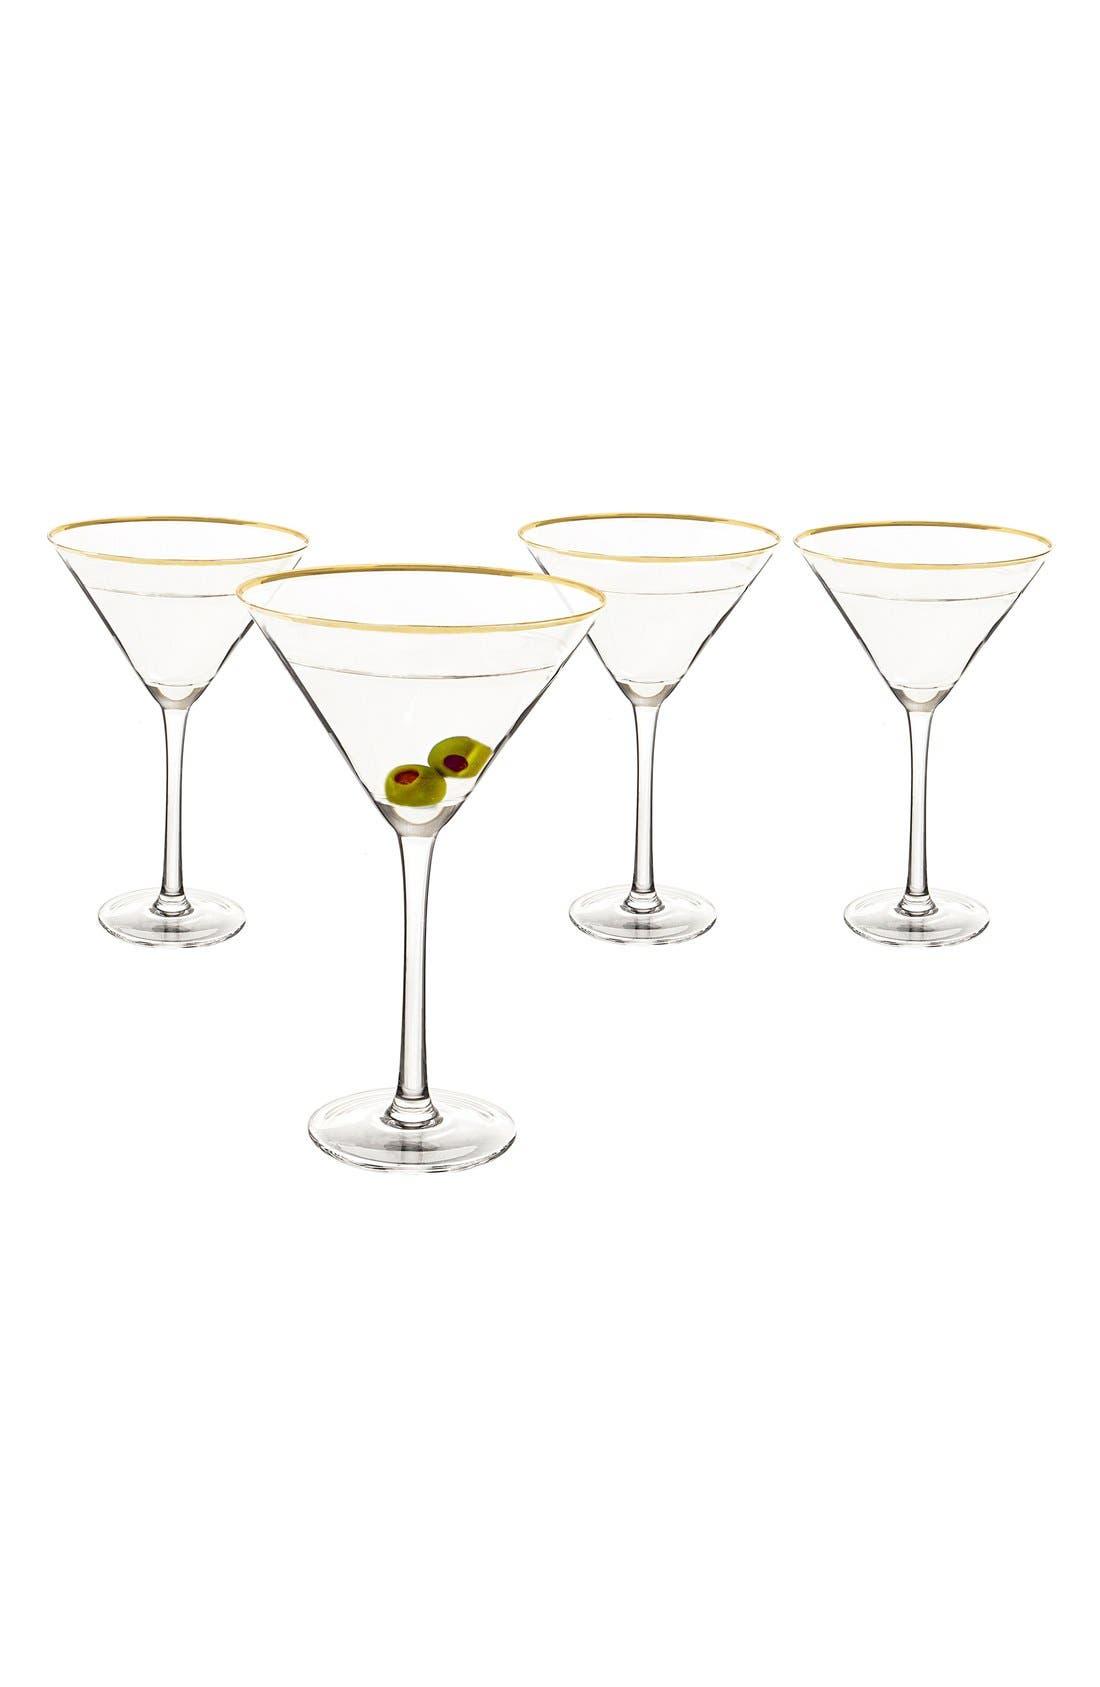 Set of 4 Gold Rimmed Monogram Martini Glasses,                         Main,                         color, 710